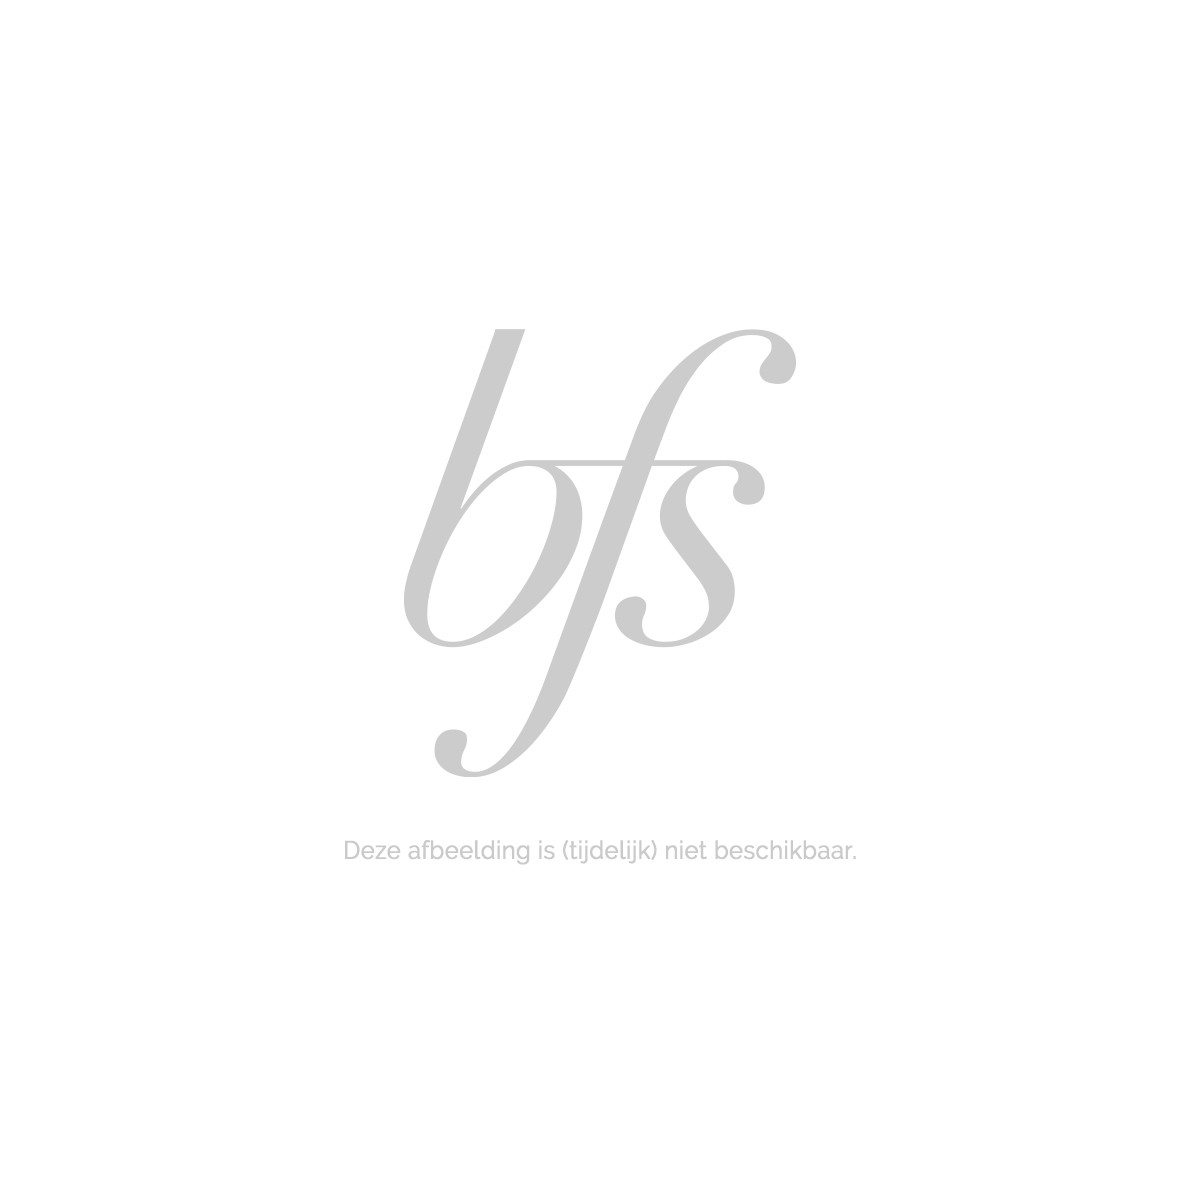 Christian Dior Diorshow Art Pen Felt-Tip Eyeliner 1,10 Ml